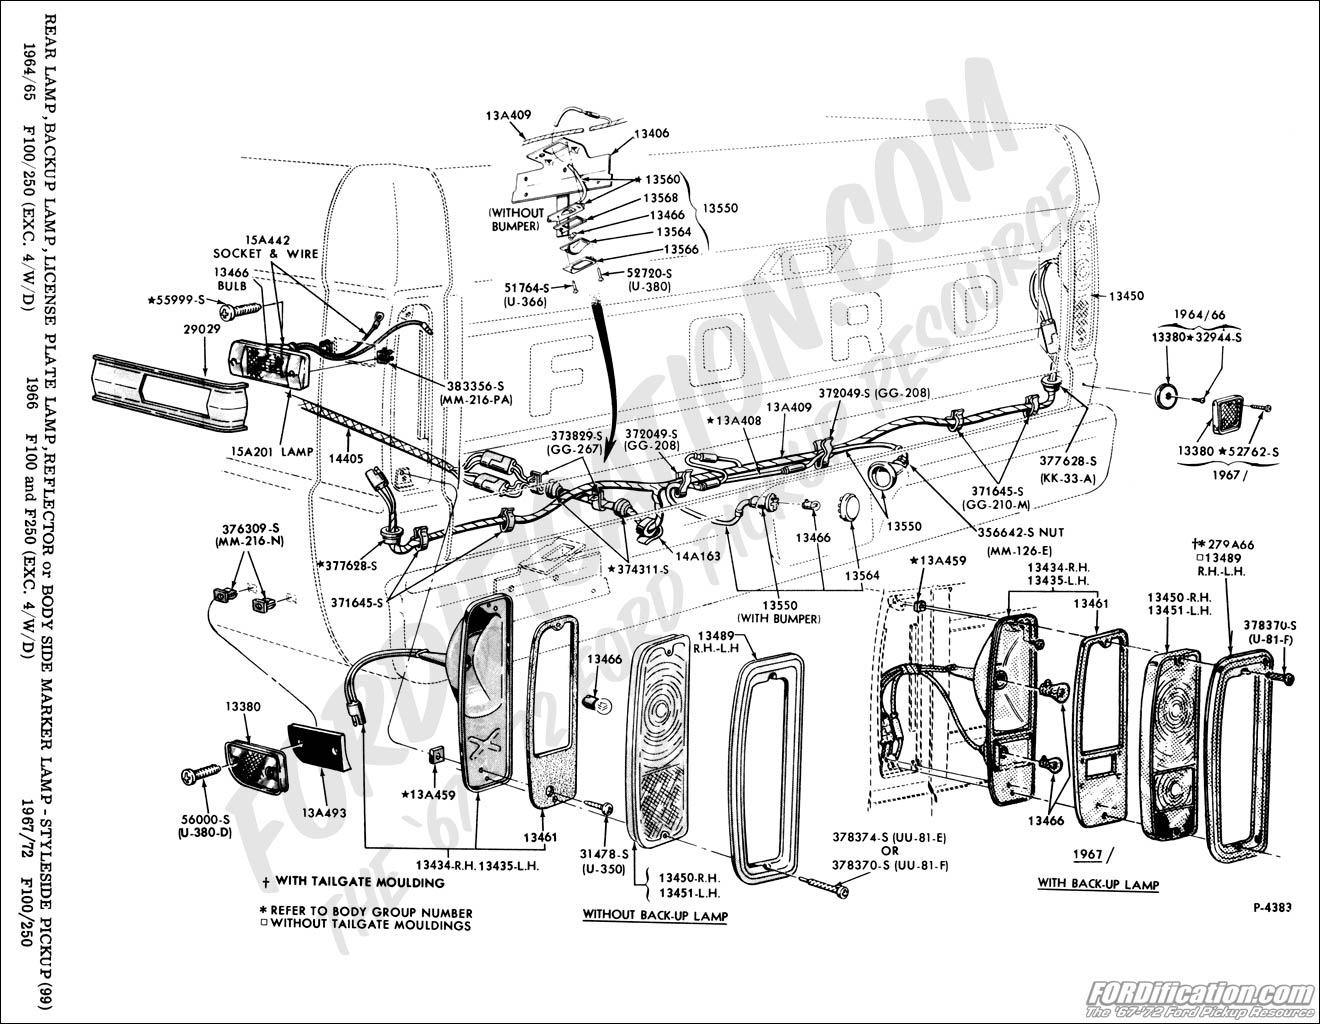 diablo mini chopper 125cc wiring diagram